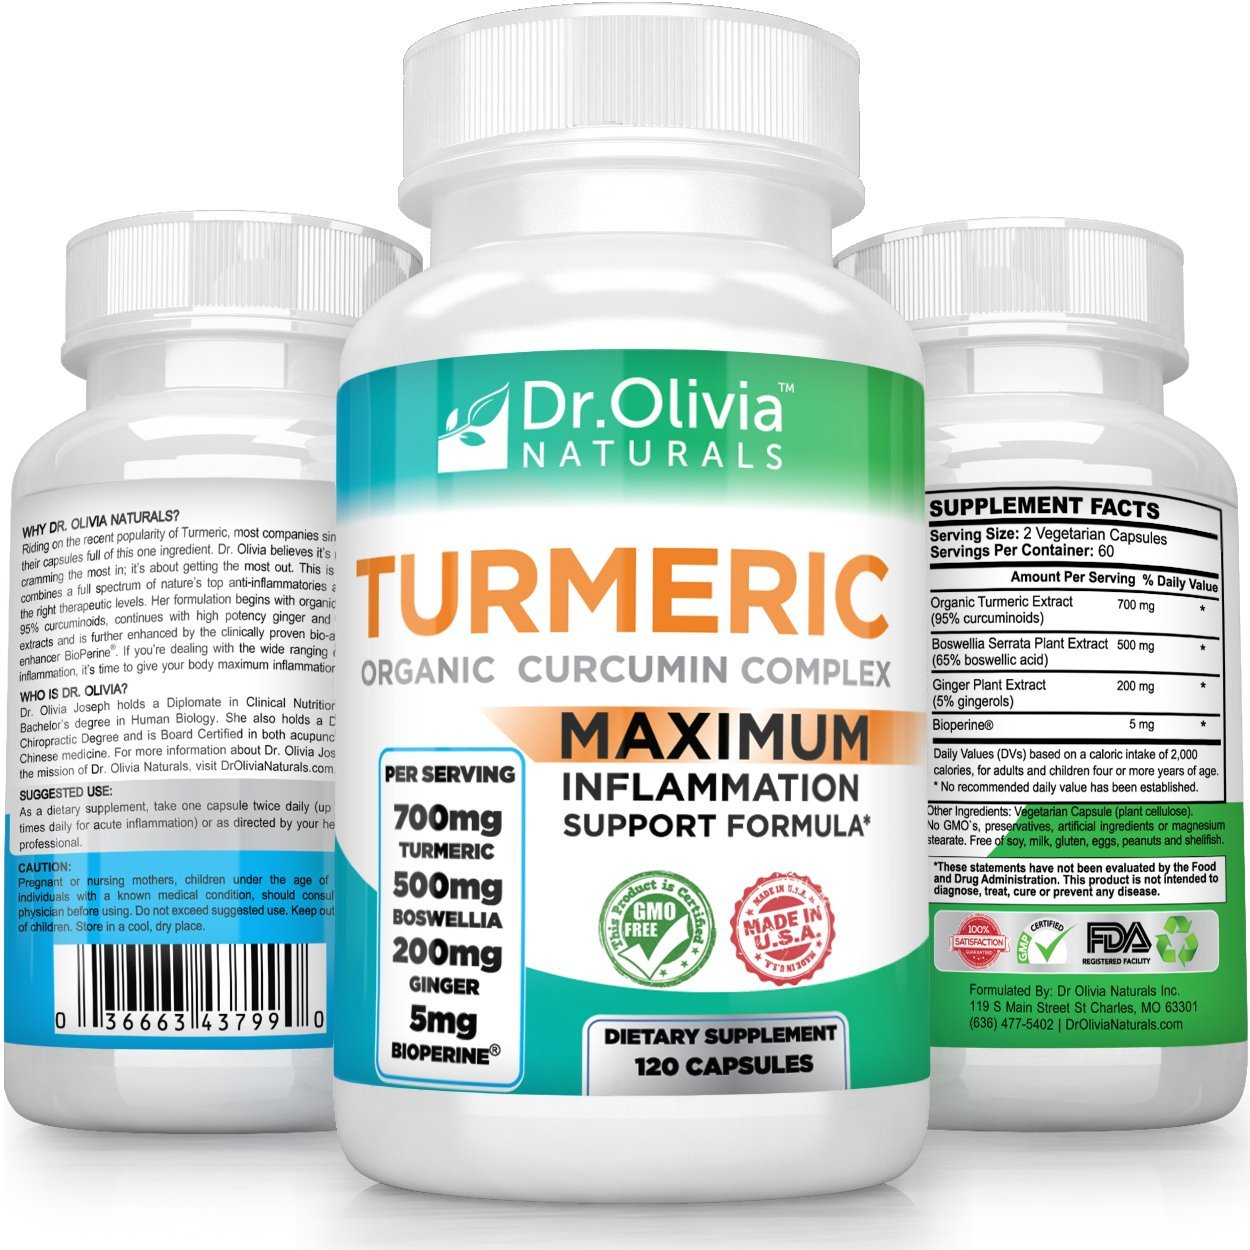 Organic Turmeric Curcumin w/Ginger, Boswellia & BioPerine® Formulated by Clinical Nutritionist Dr. Olivia Joseph [120 Caps - 2 Mo Supply]